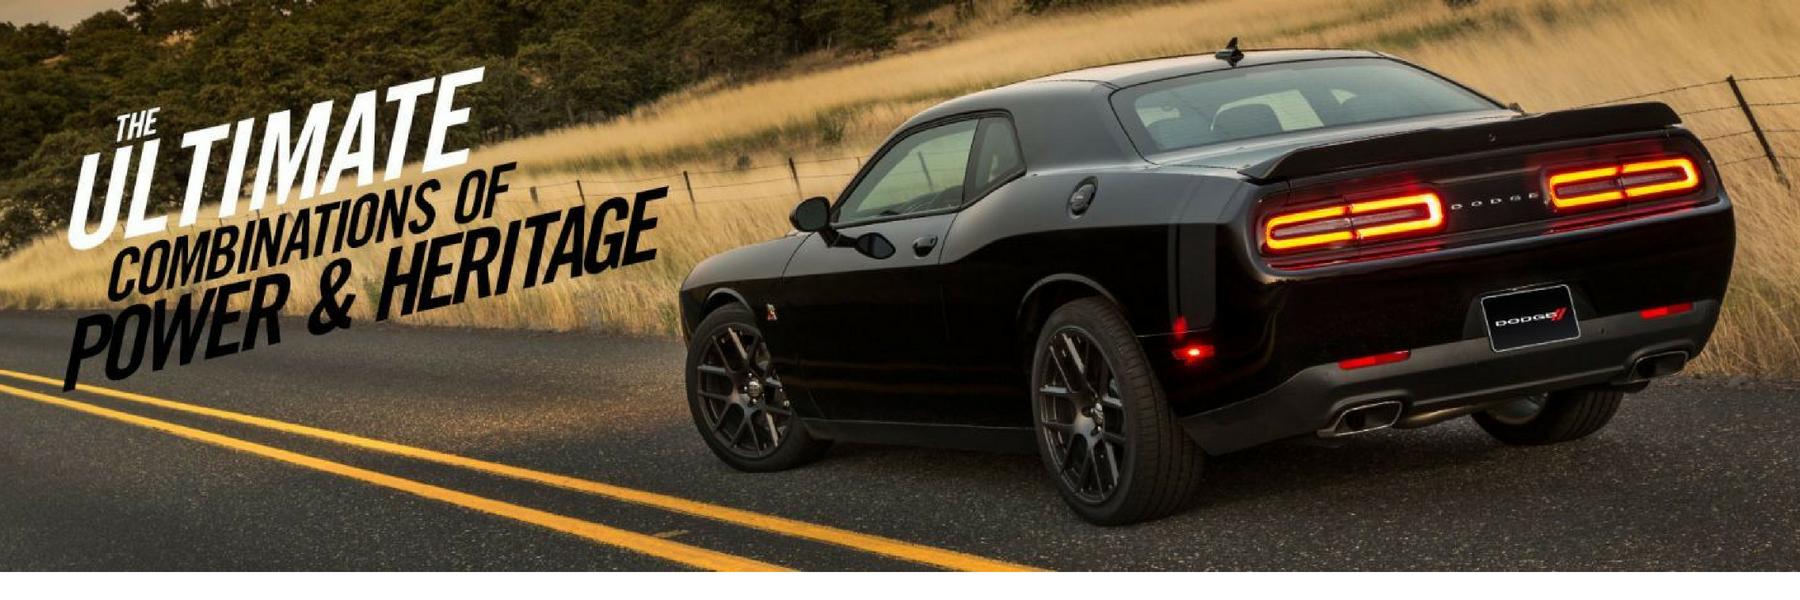 New 2018 Dodge Challenger Noblesville IN